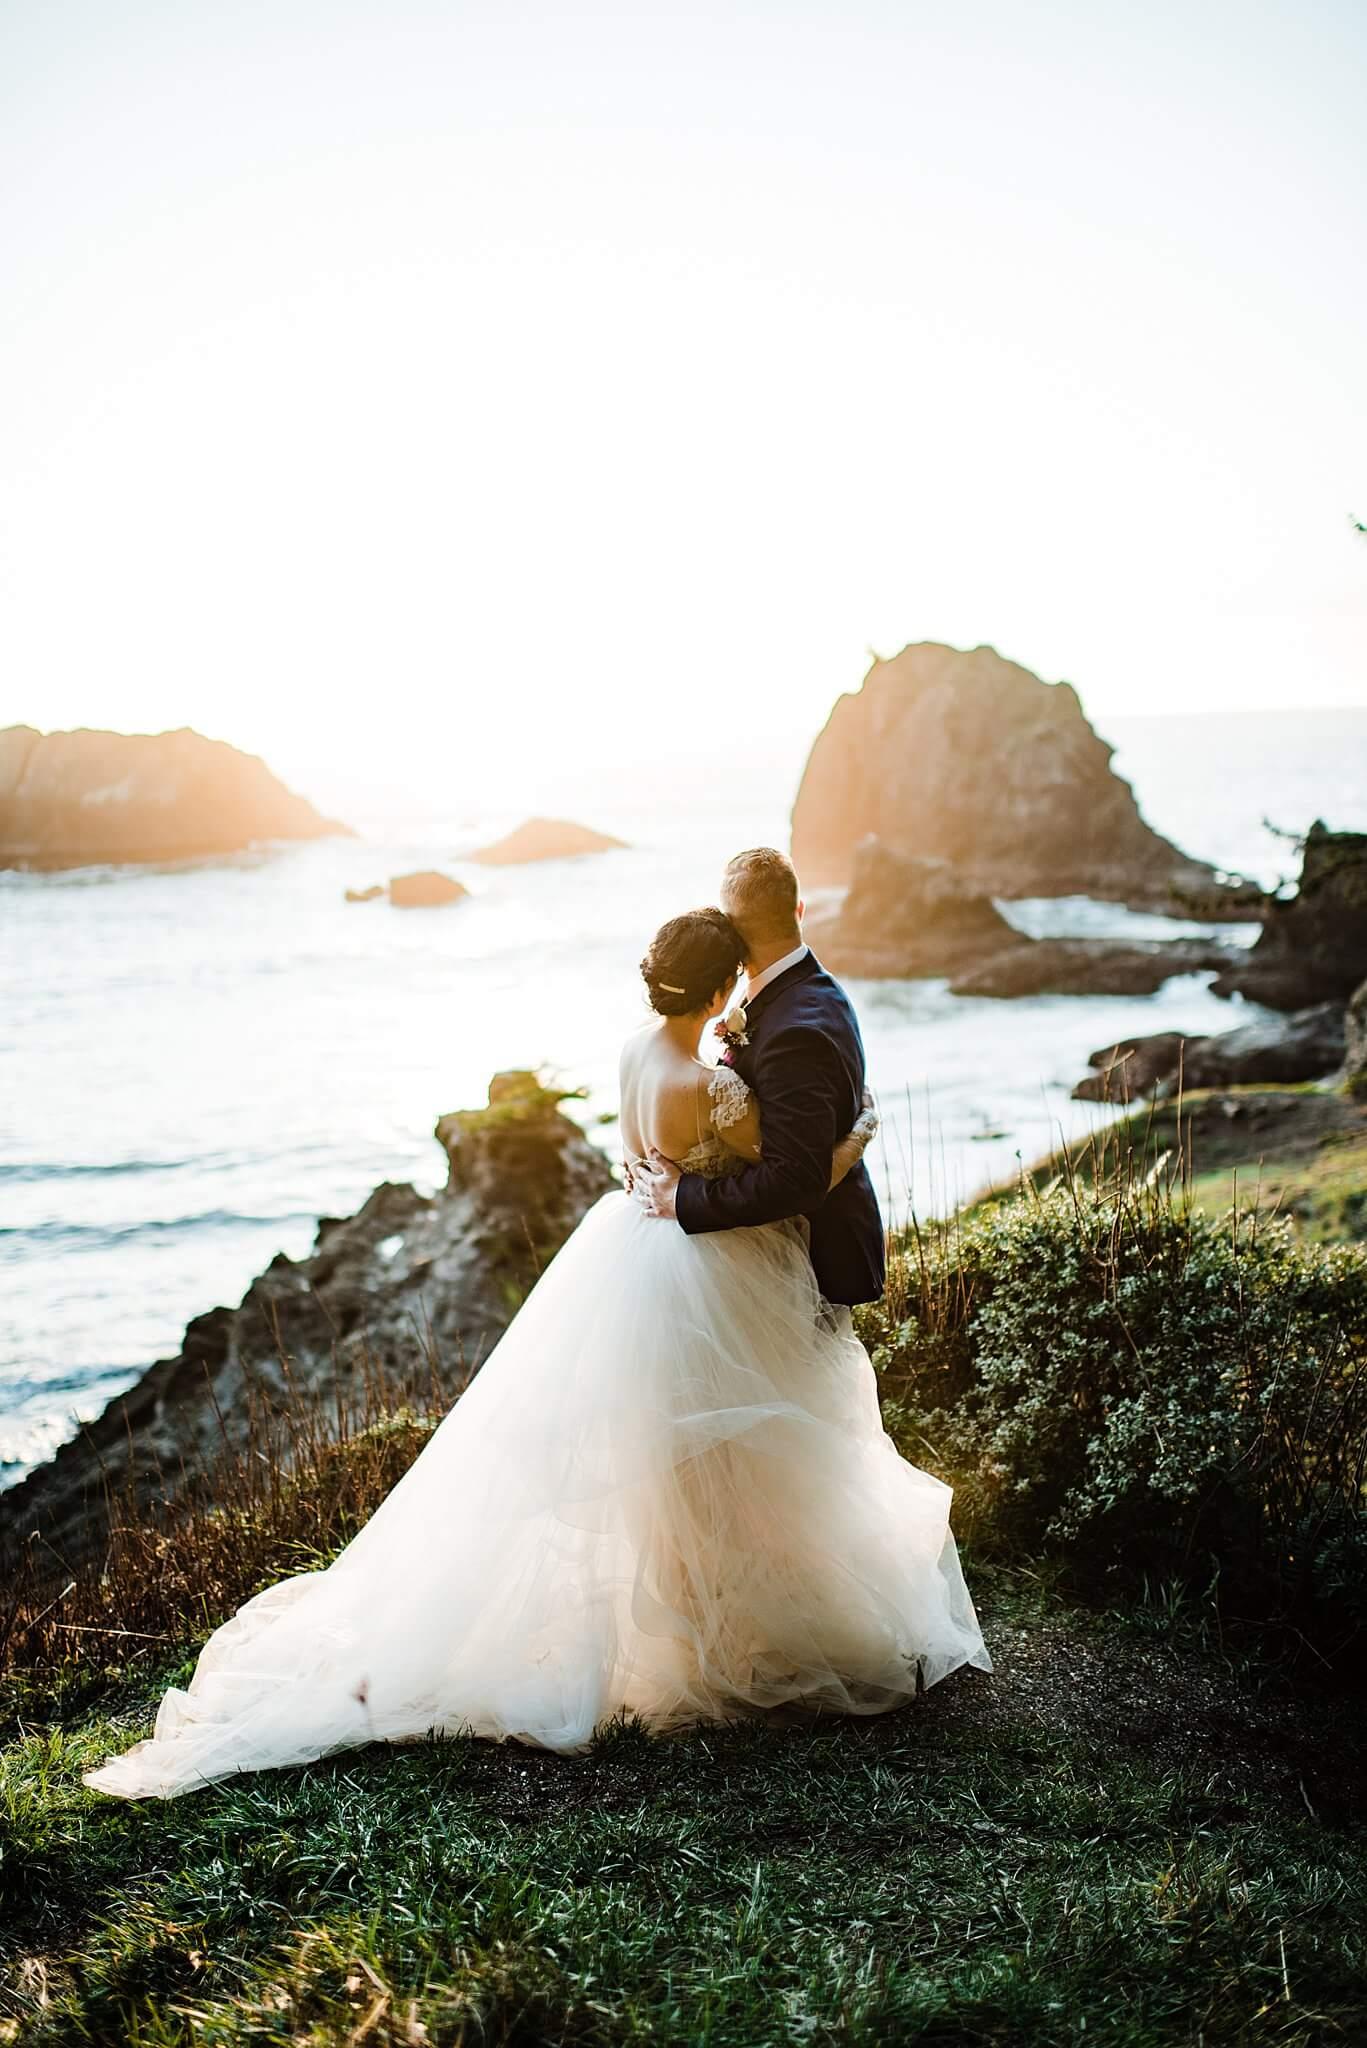 S Photography,adventure,adventure photographer,boho,elope,elopement,hayley paige,indie,jedediah smith,oregon,oregon coast,redwoods,roseburg,samuel h boardman,